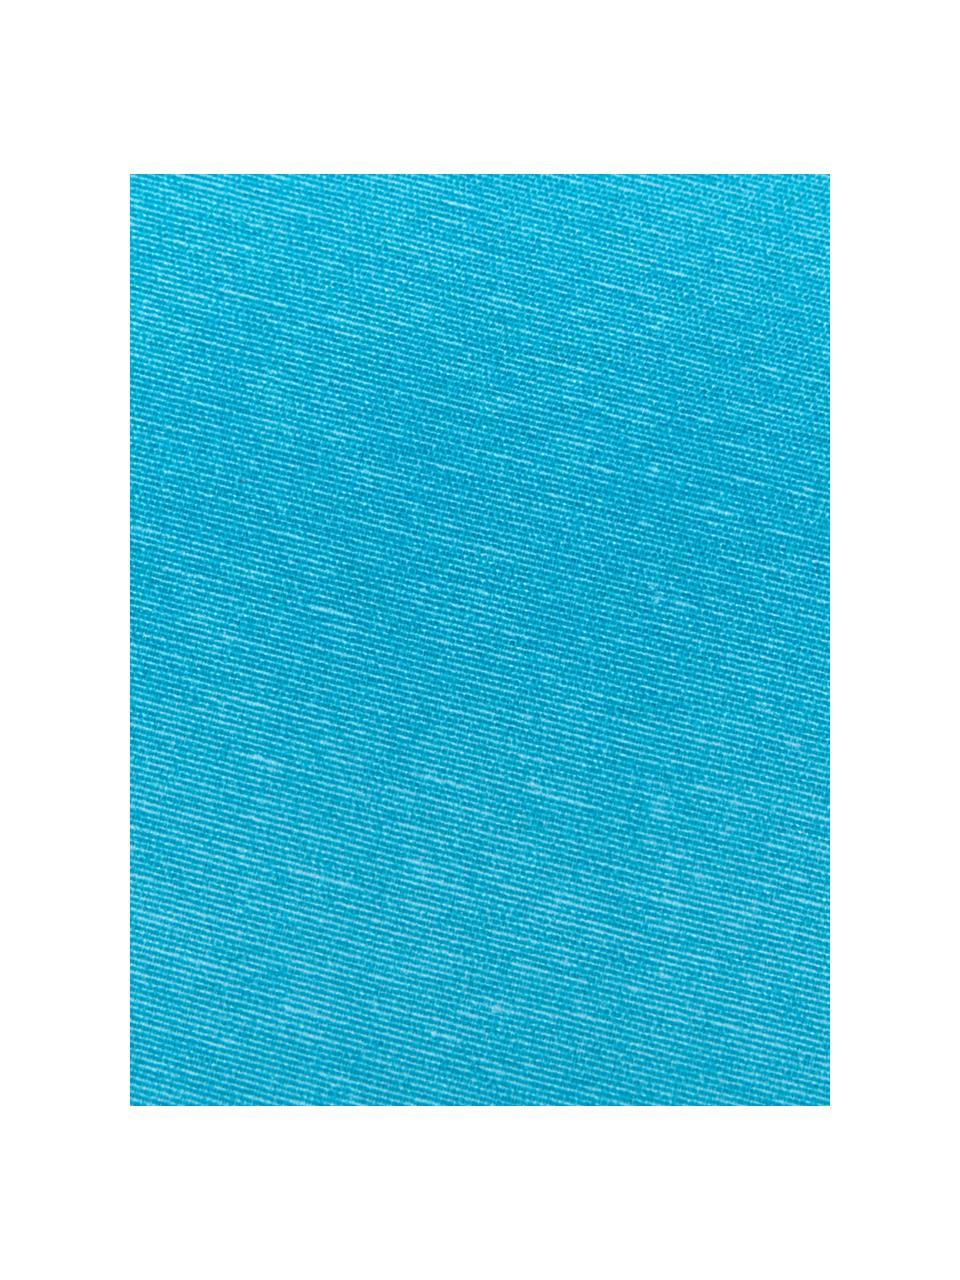 Einfarbige Bankauflage Panama in Türkis, Bezug: 50% Baumwolle, 45% Polyes, Türkis, 48 x 120 cm